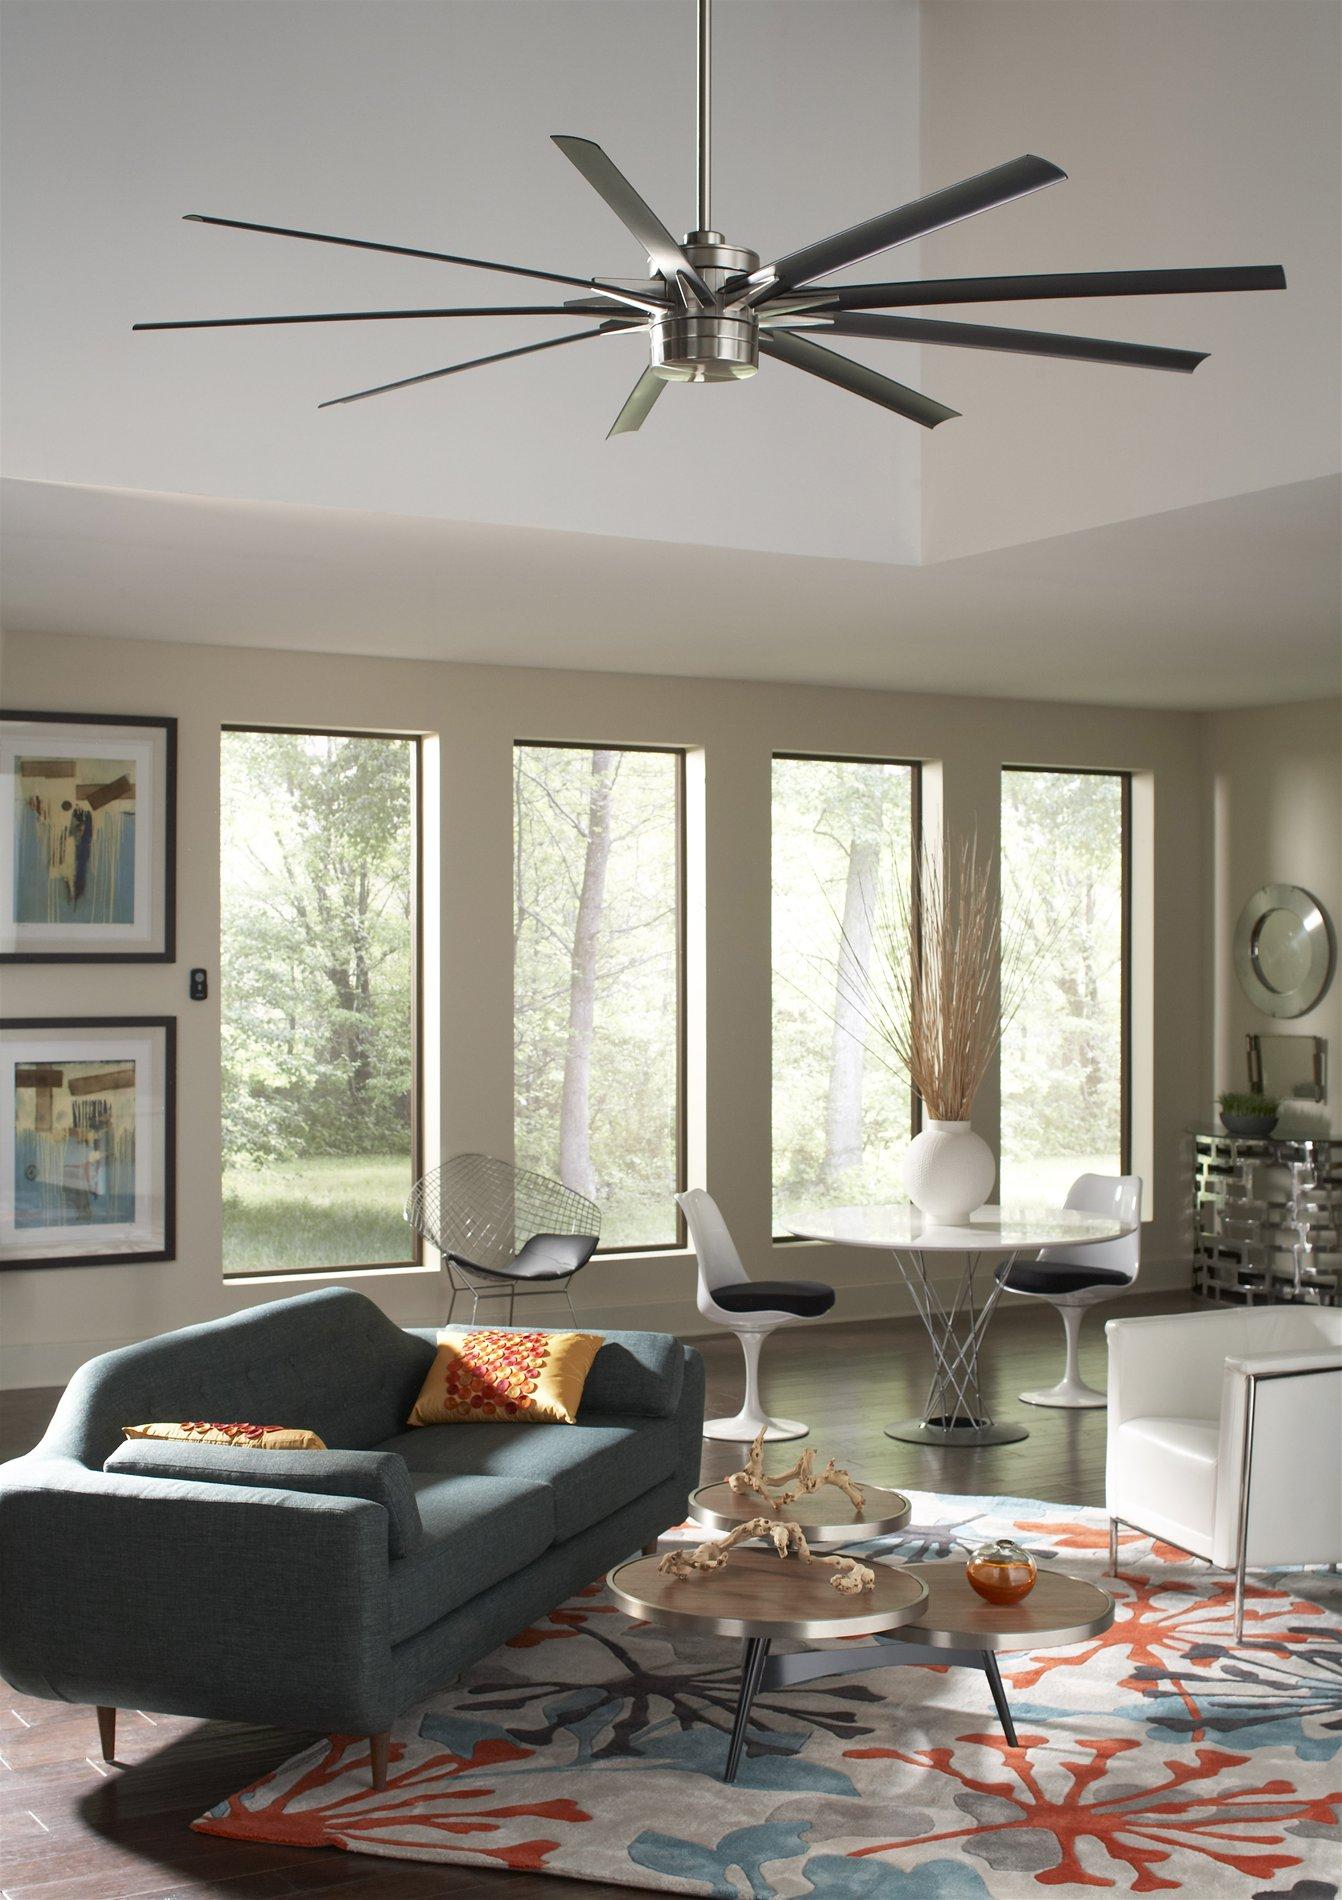 Decorating Ceiling Fan : Fanimation fpd bn odyn led quot modern contemporary